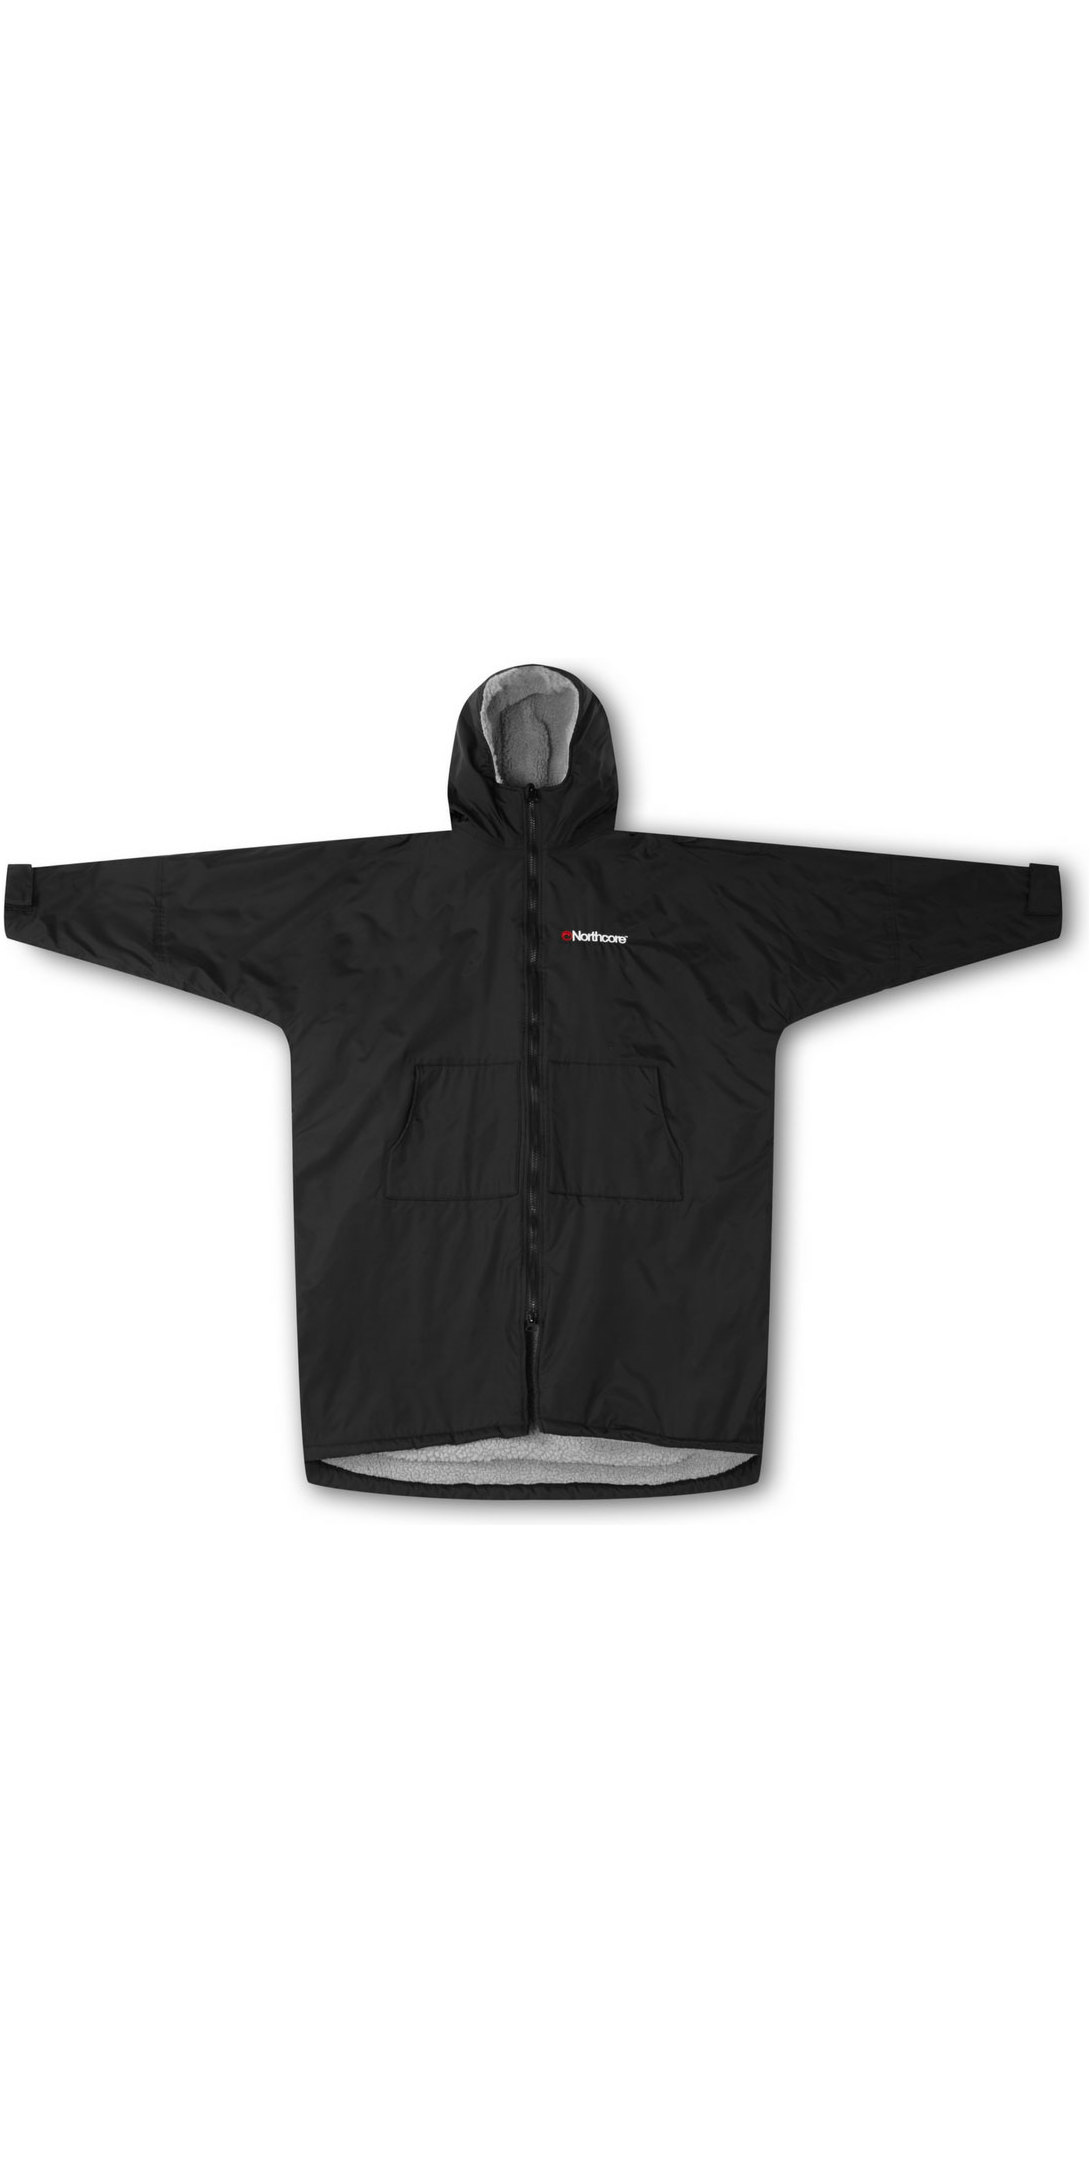 2019 Northcore Beach Basha Sport Long Sleeve Changing Robe Black NOCO24O